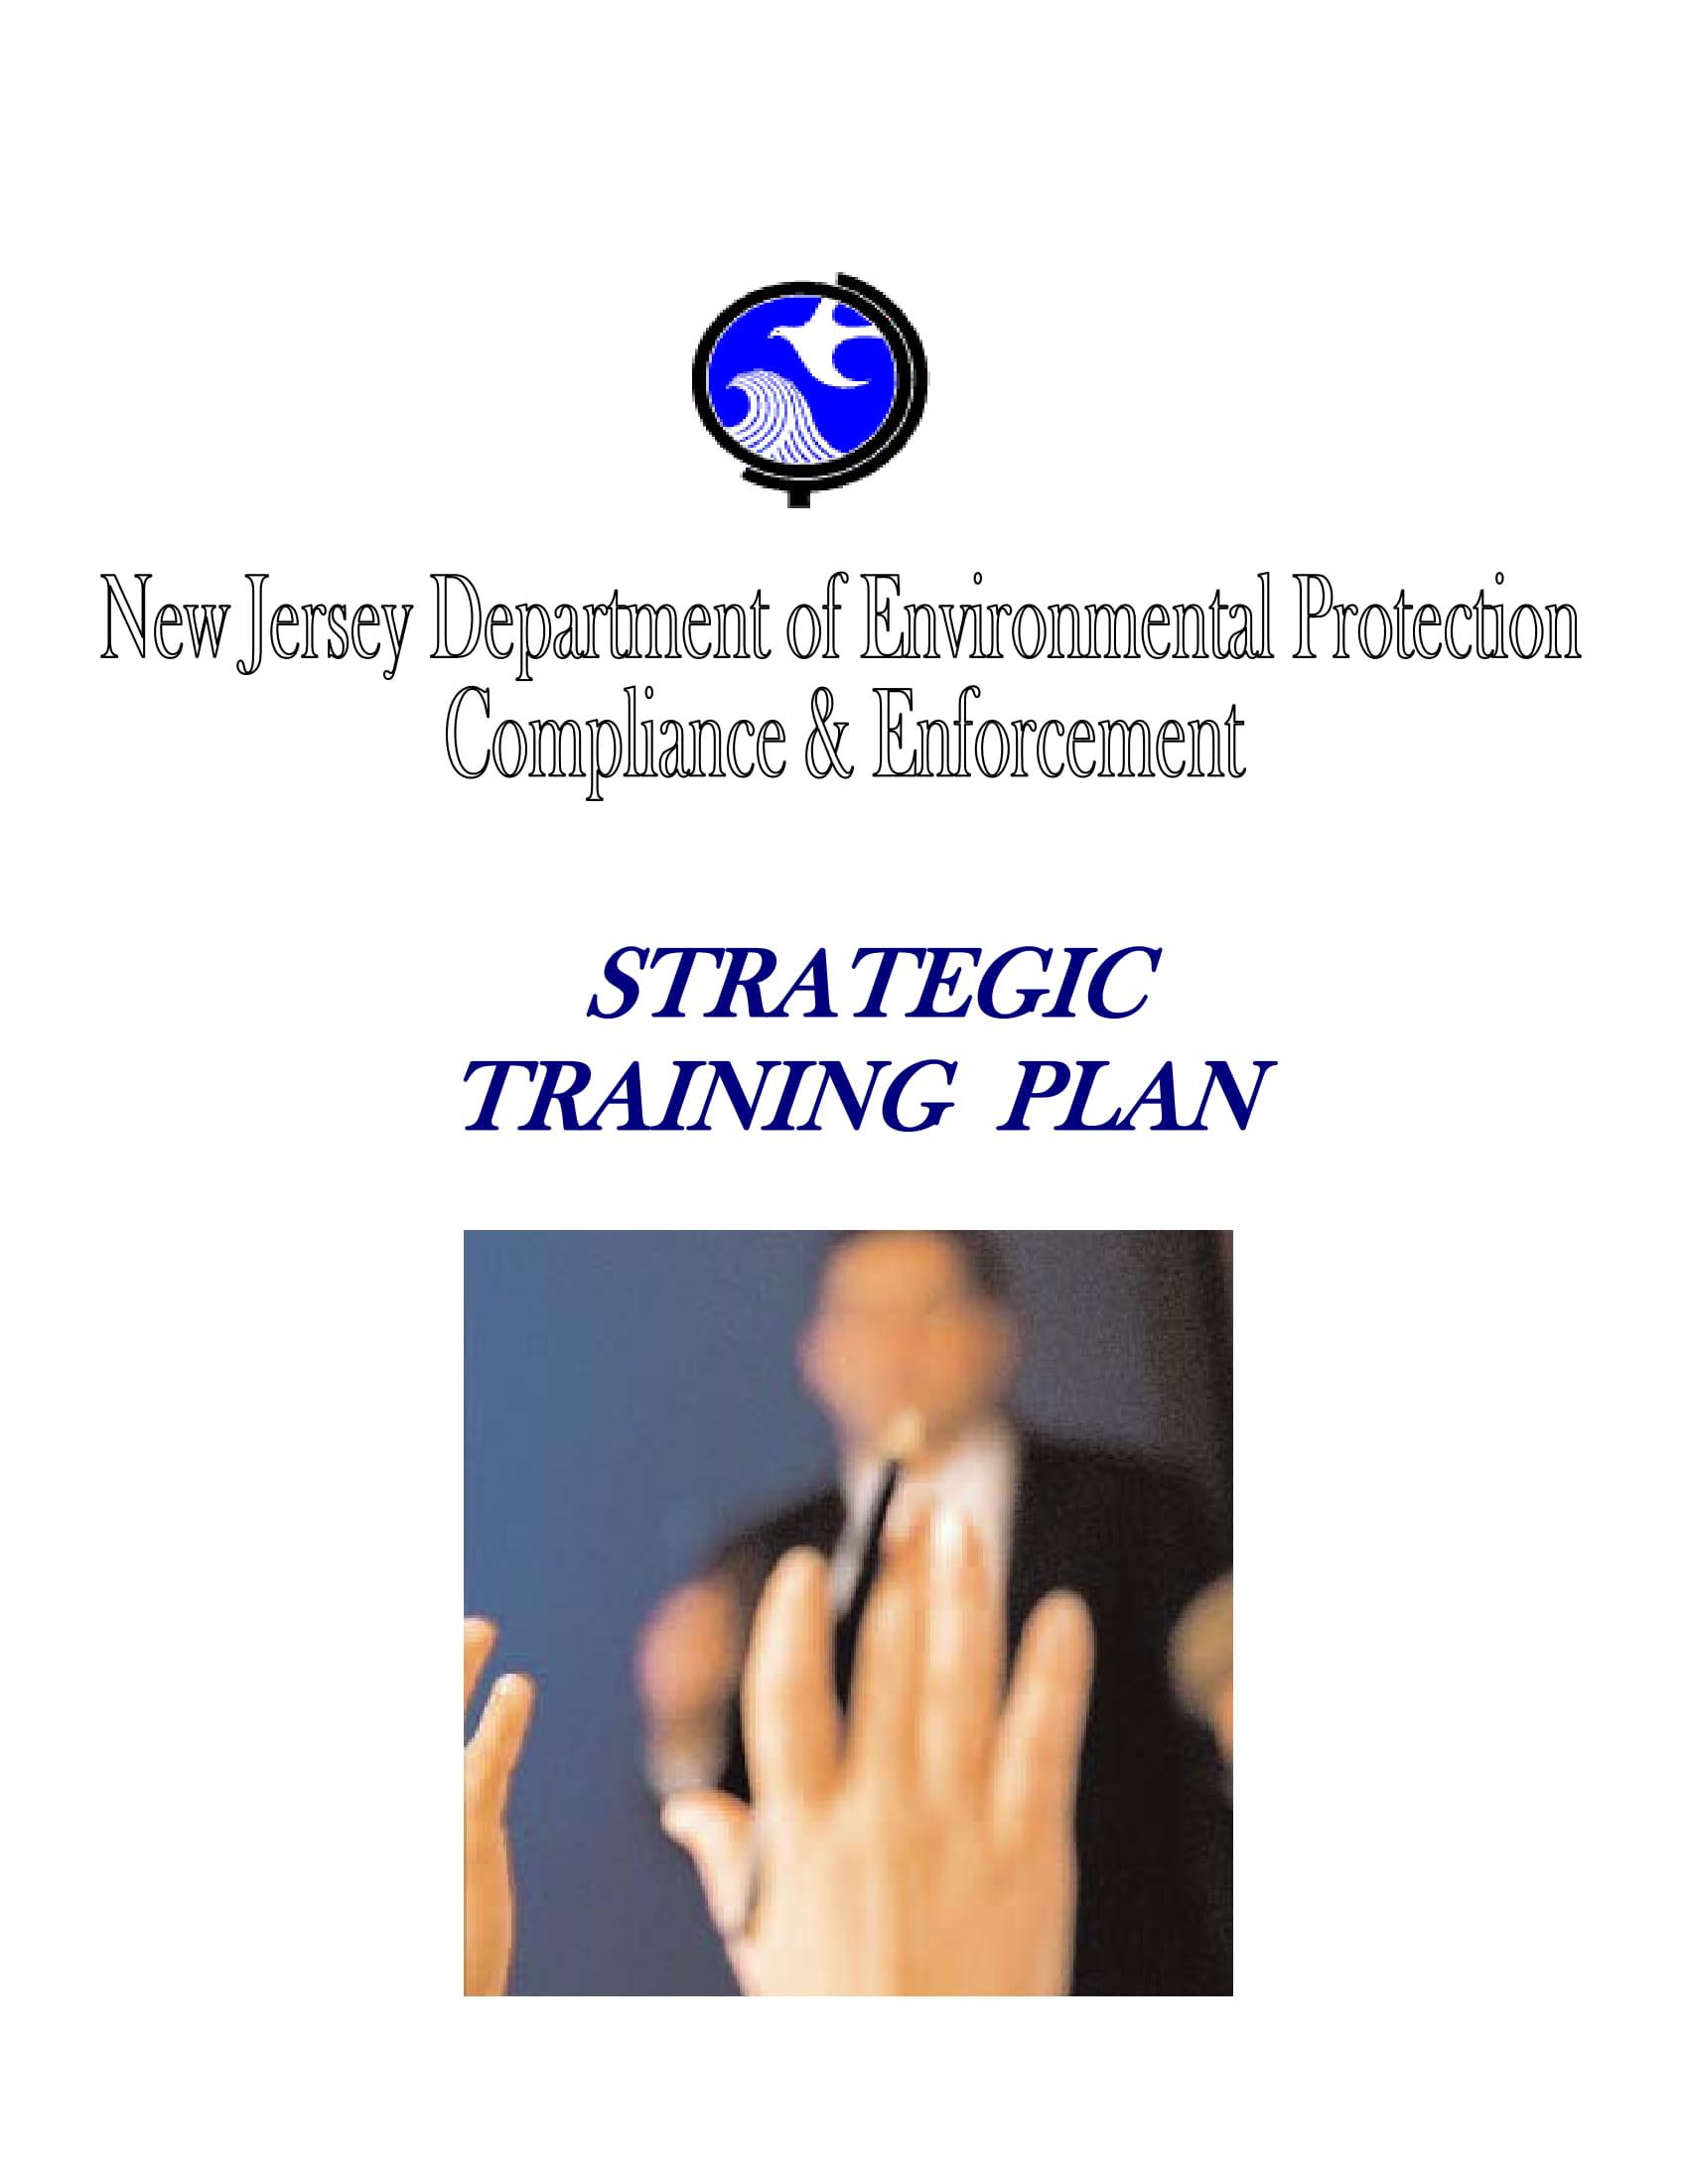 strategic training project plan